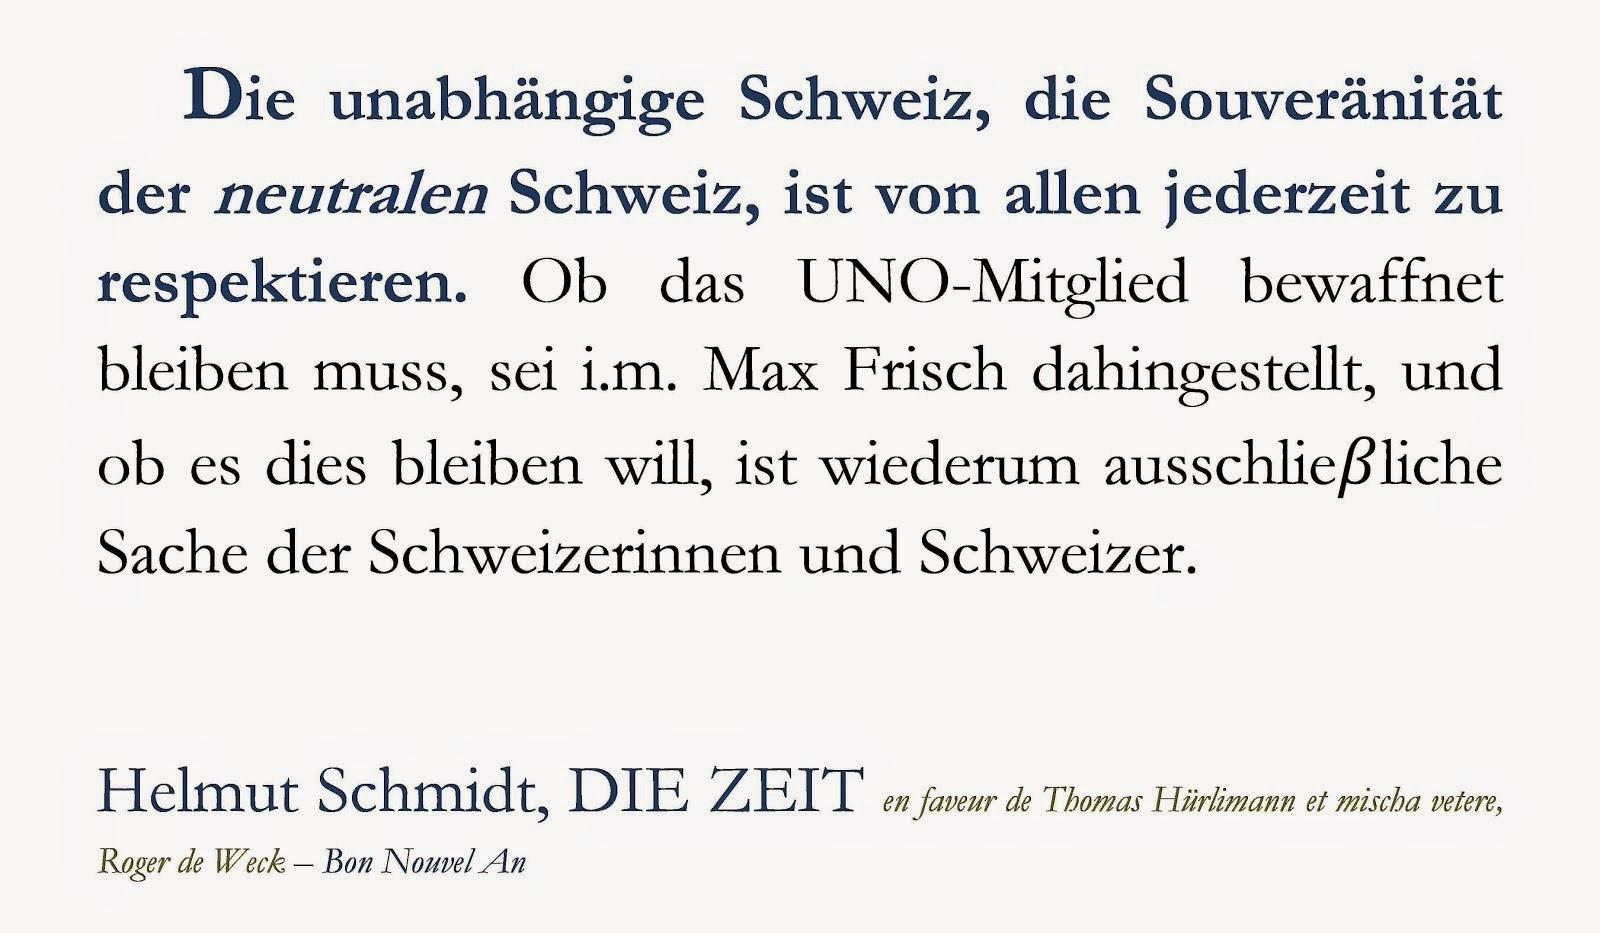 helmut schmidt DIE ZEIT schweiz thomas hürlimann roger de weck mischa vetere exil berlin hamburg mf